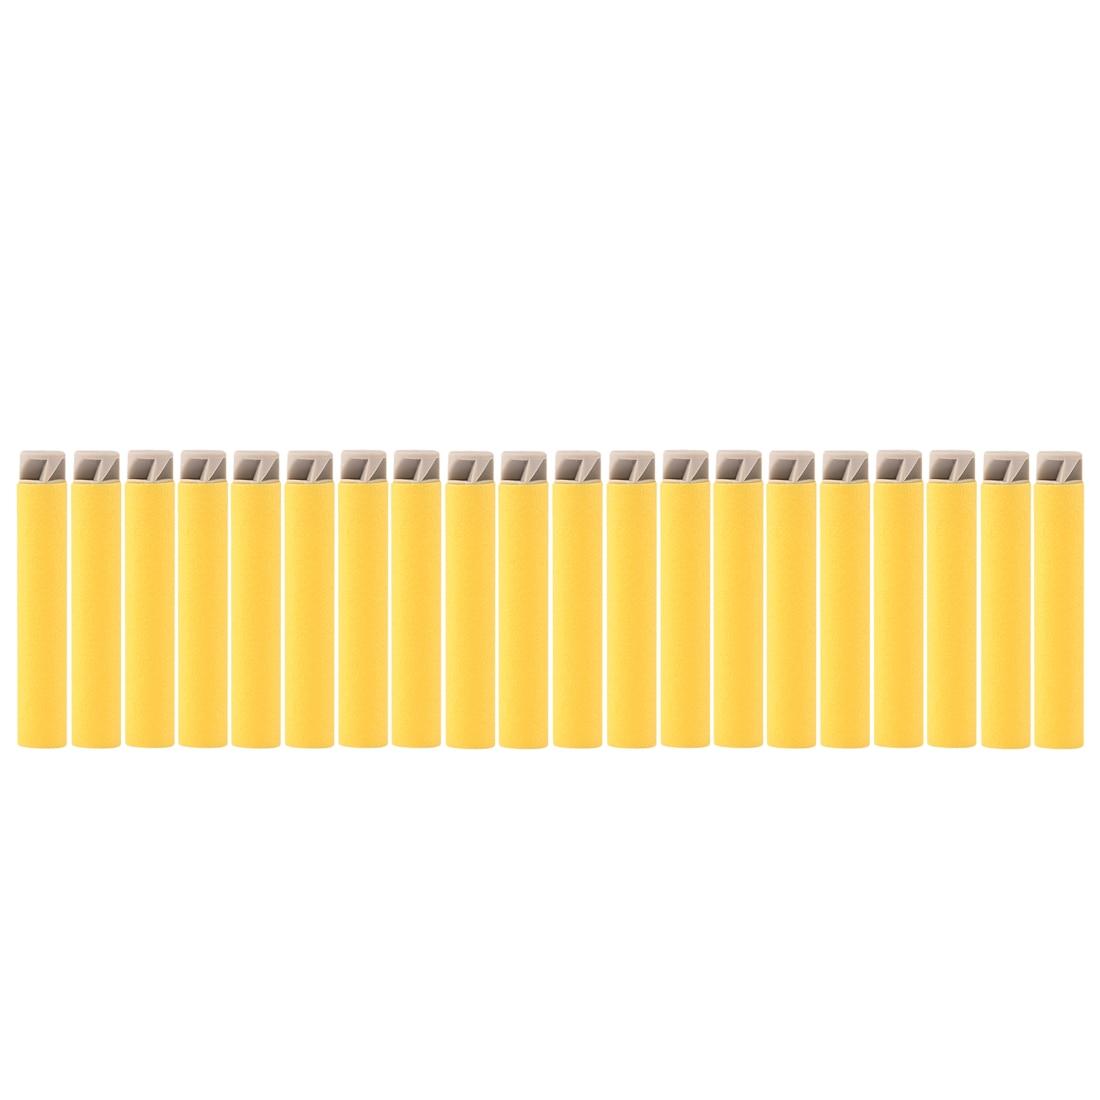 Hot Sale 20pcs Flat Darts Soft Bullet For Nerf Series Grey Head Yellow